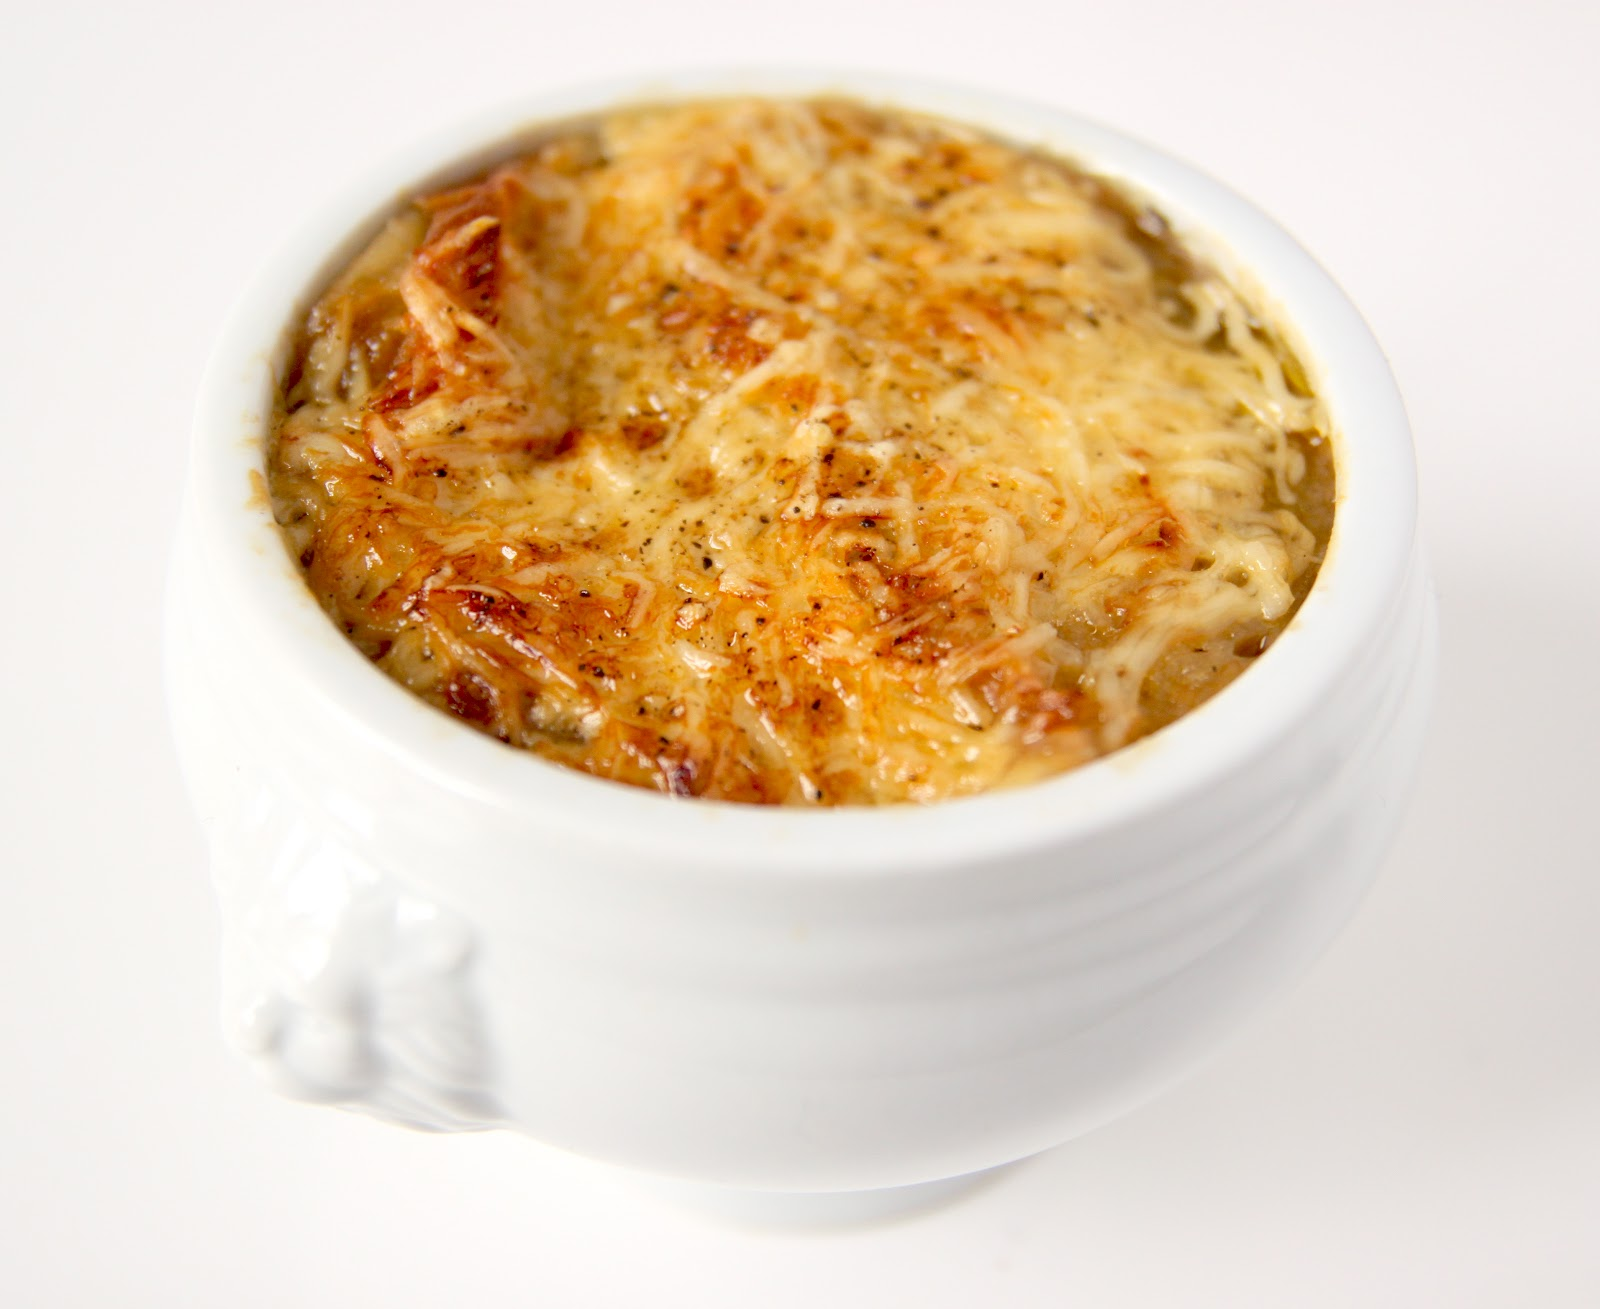 La cuisine de bernard soupe gratin e l 39 oignon - Soupe a l oignon gratinee ...